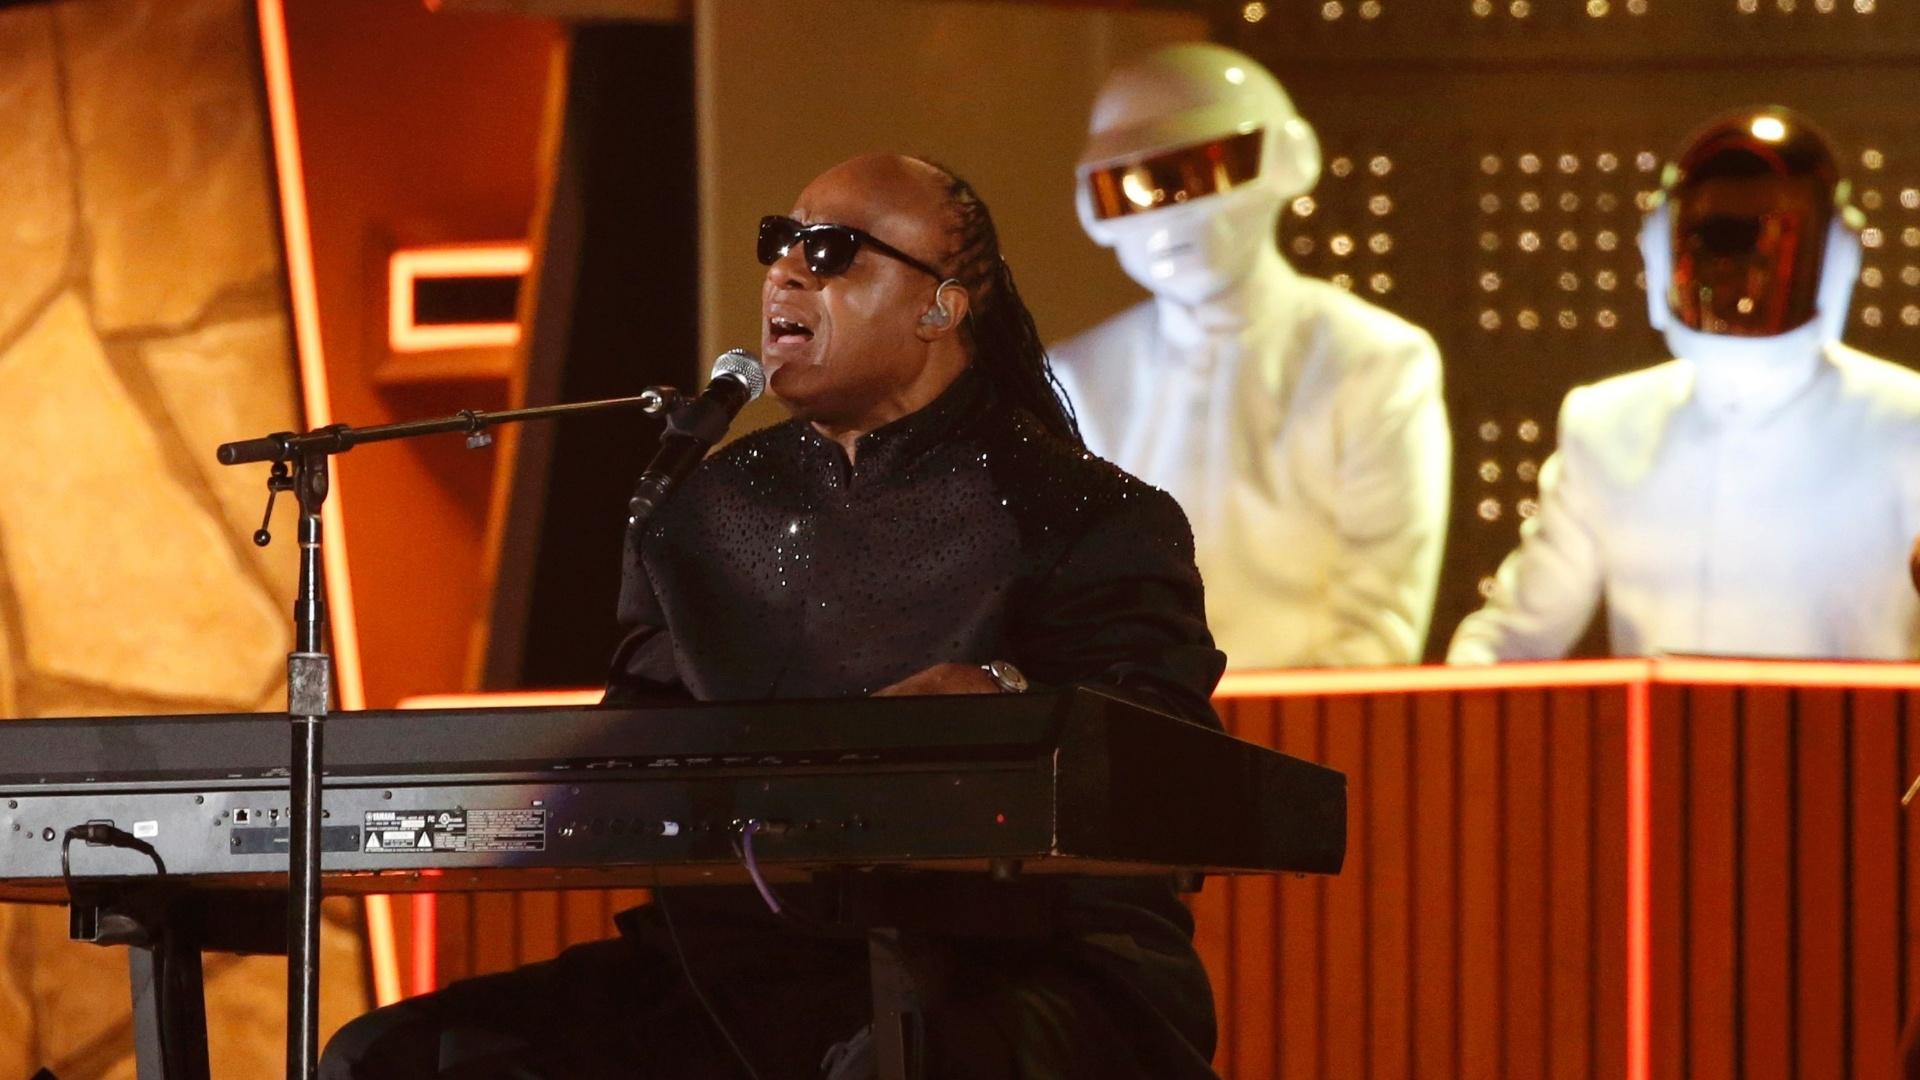 26.jan.2014 - Daft Punk, ao fundo, apresentou o hit